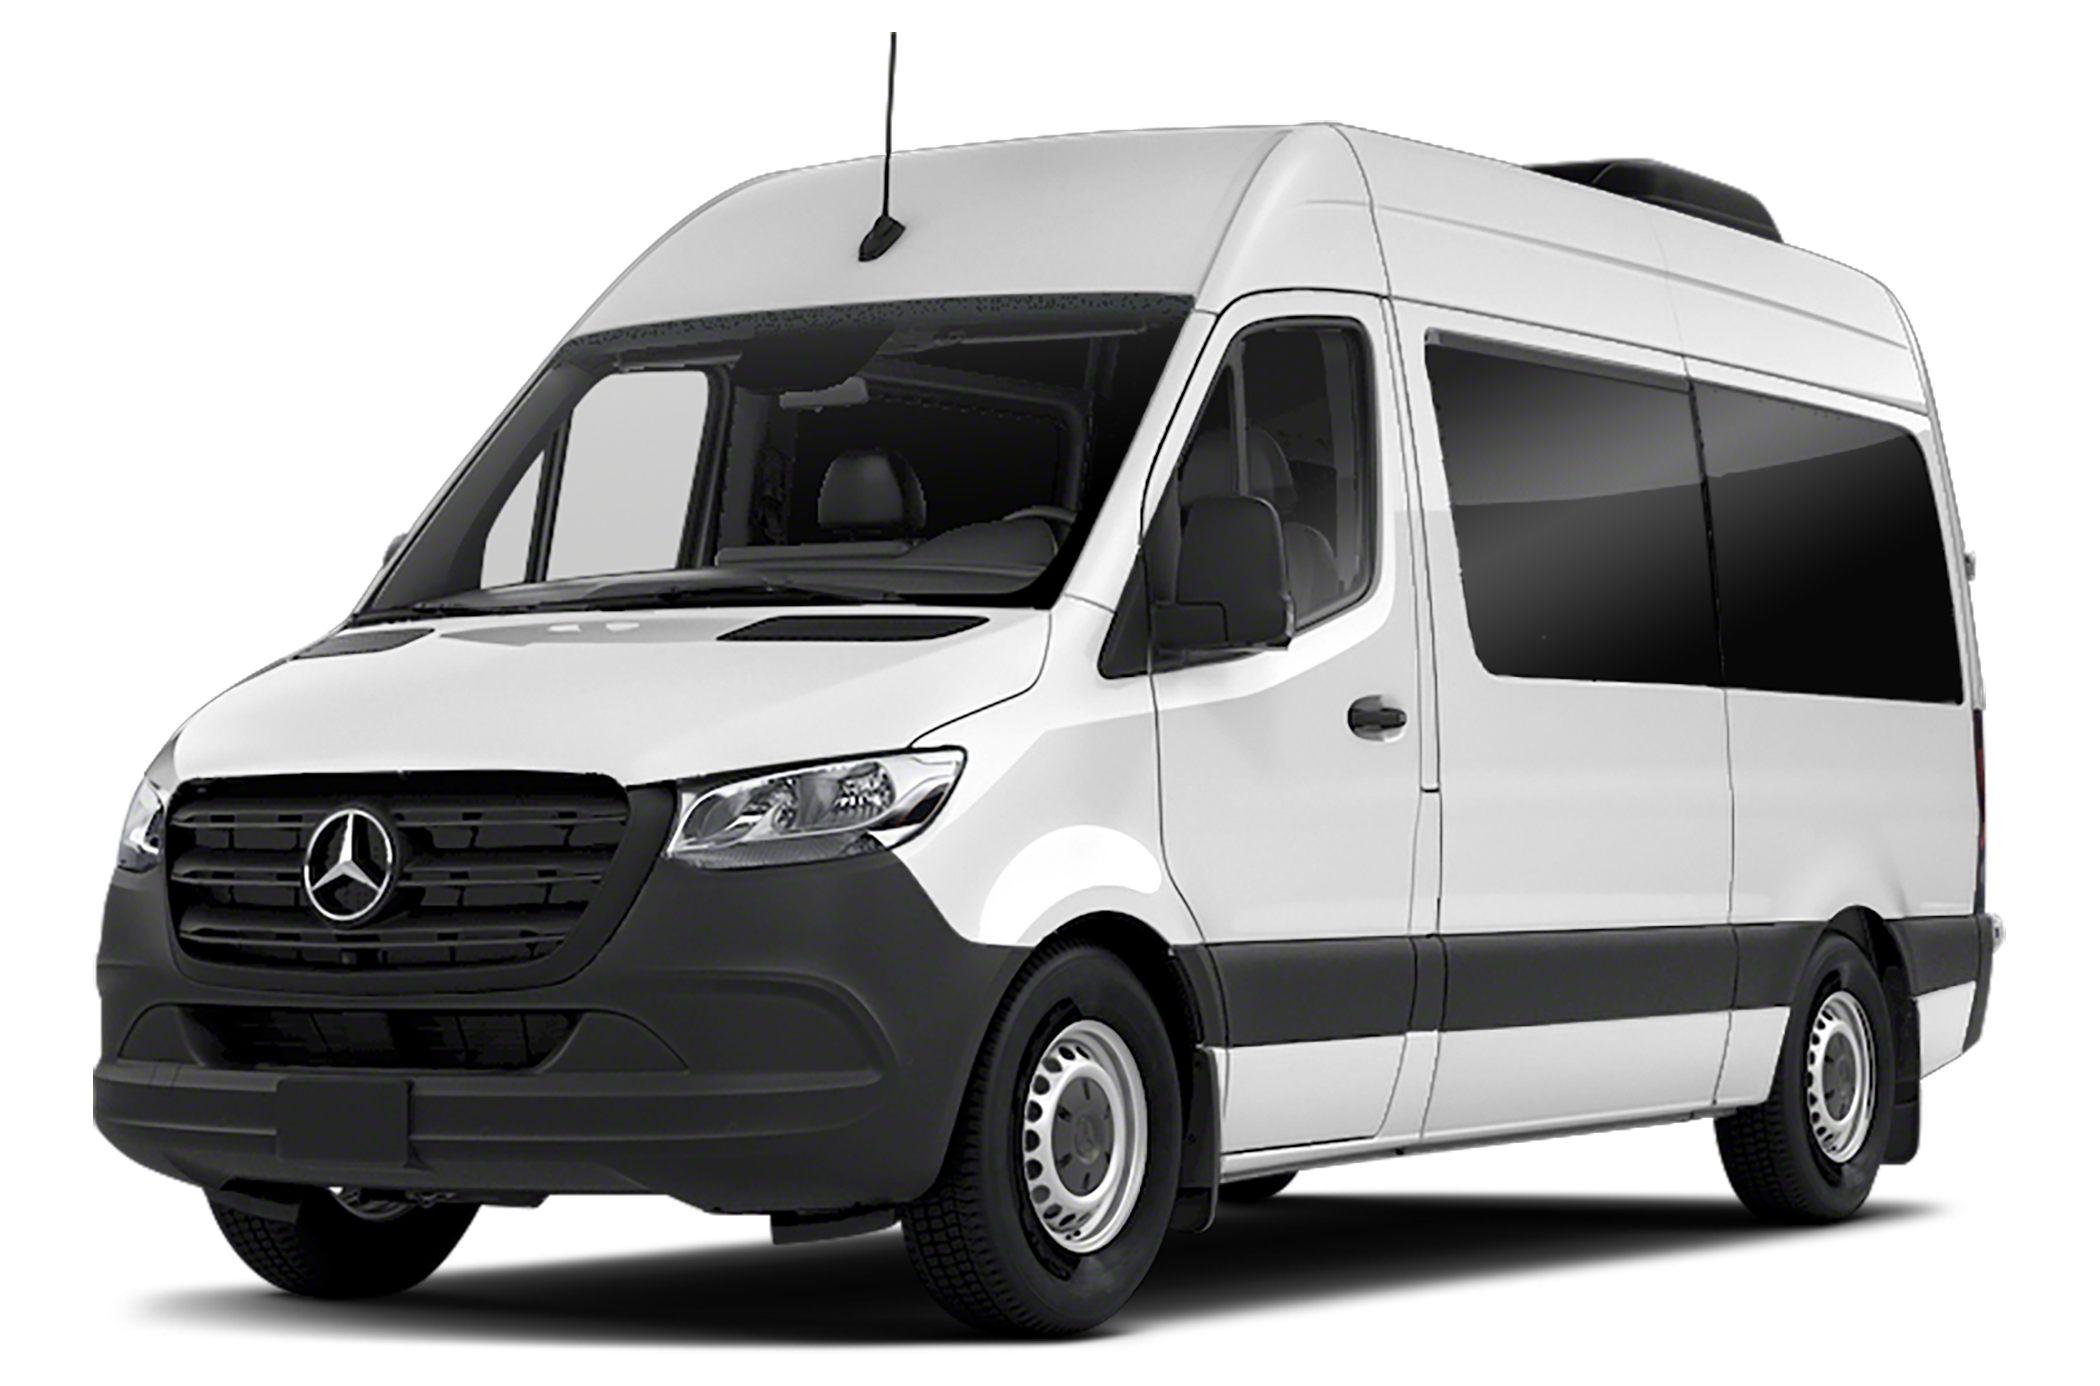 12 Mercedes Benz Sprinter 12 Standard Roof V12 Sprinter 12 Passenger  Van 12 in. WB 12WD Specs and Prices